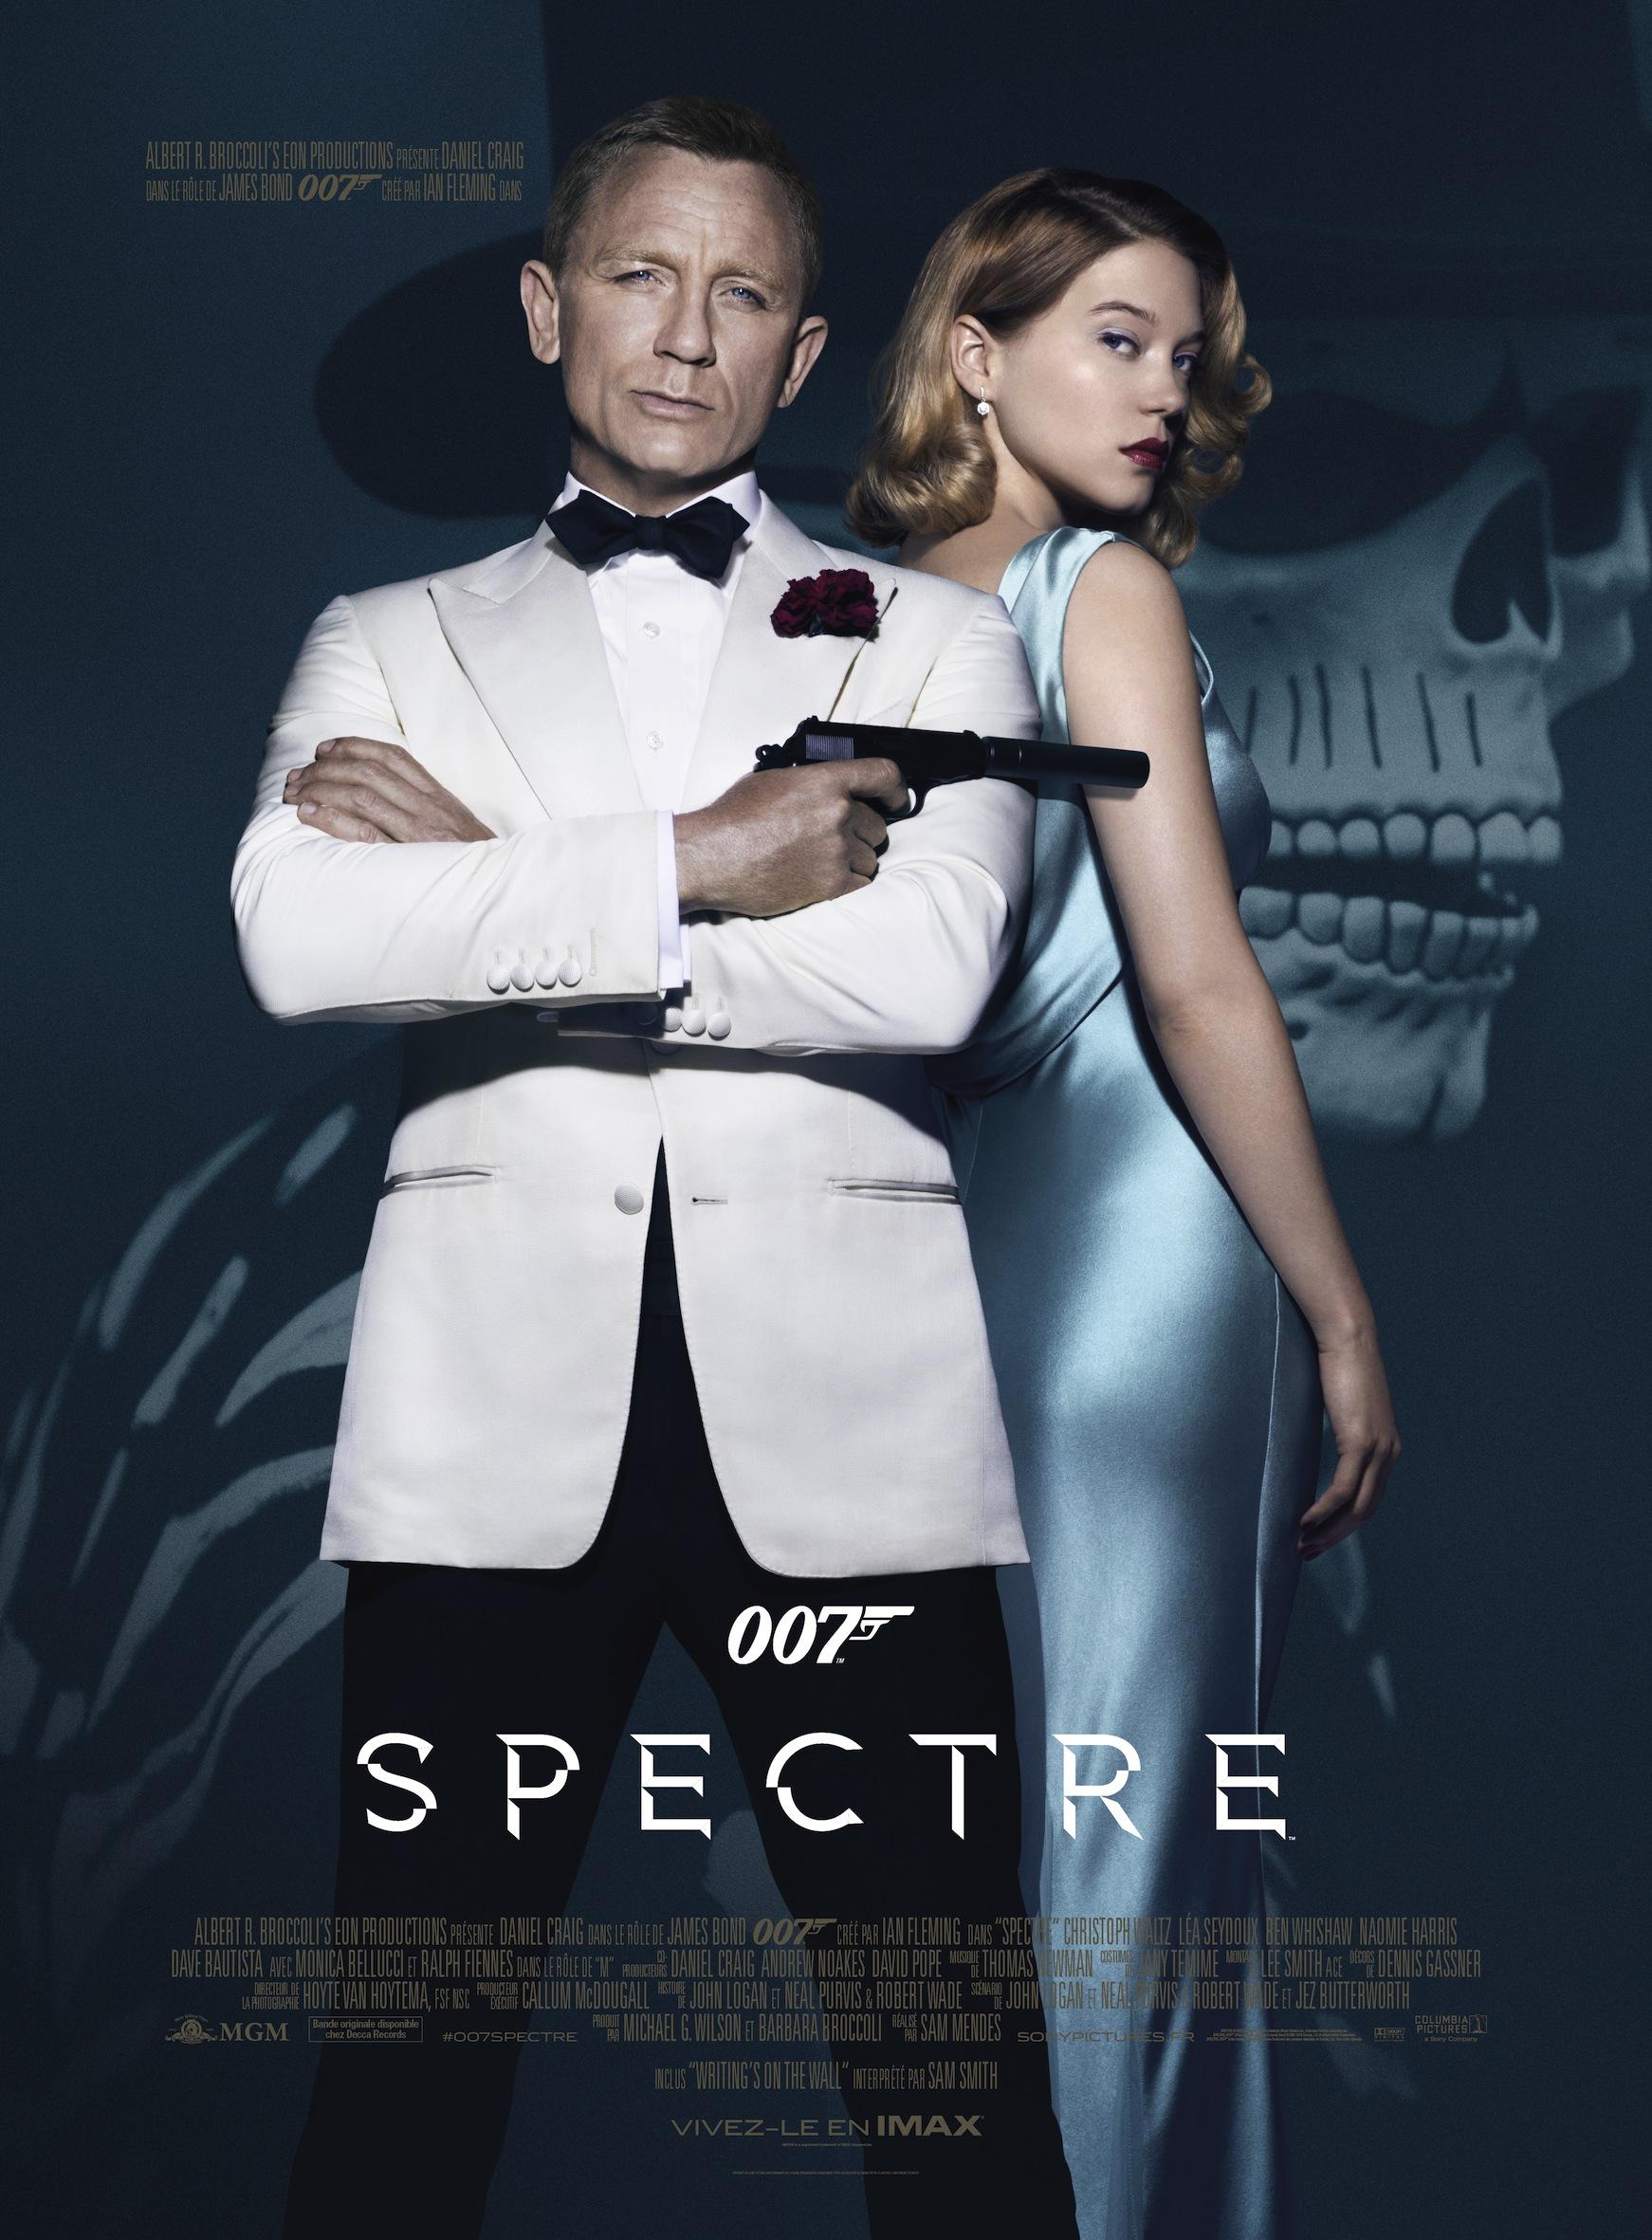 007 spectre 2015 un film de sam mendes news date de sortie critique bande. Black Bedroom Furniture Sets. Home Design Ideas